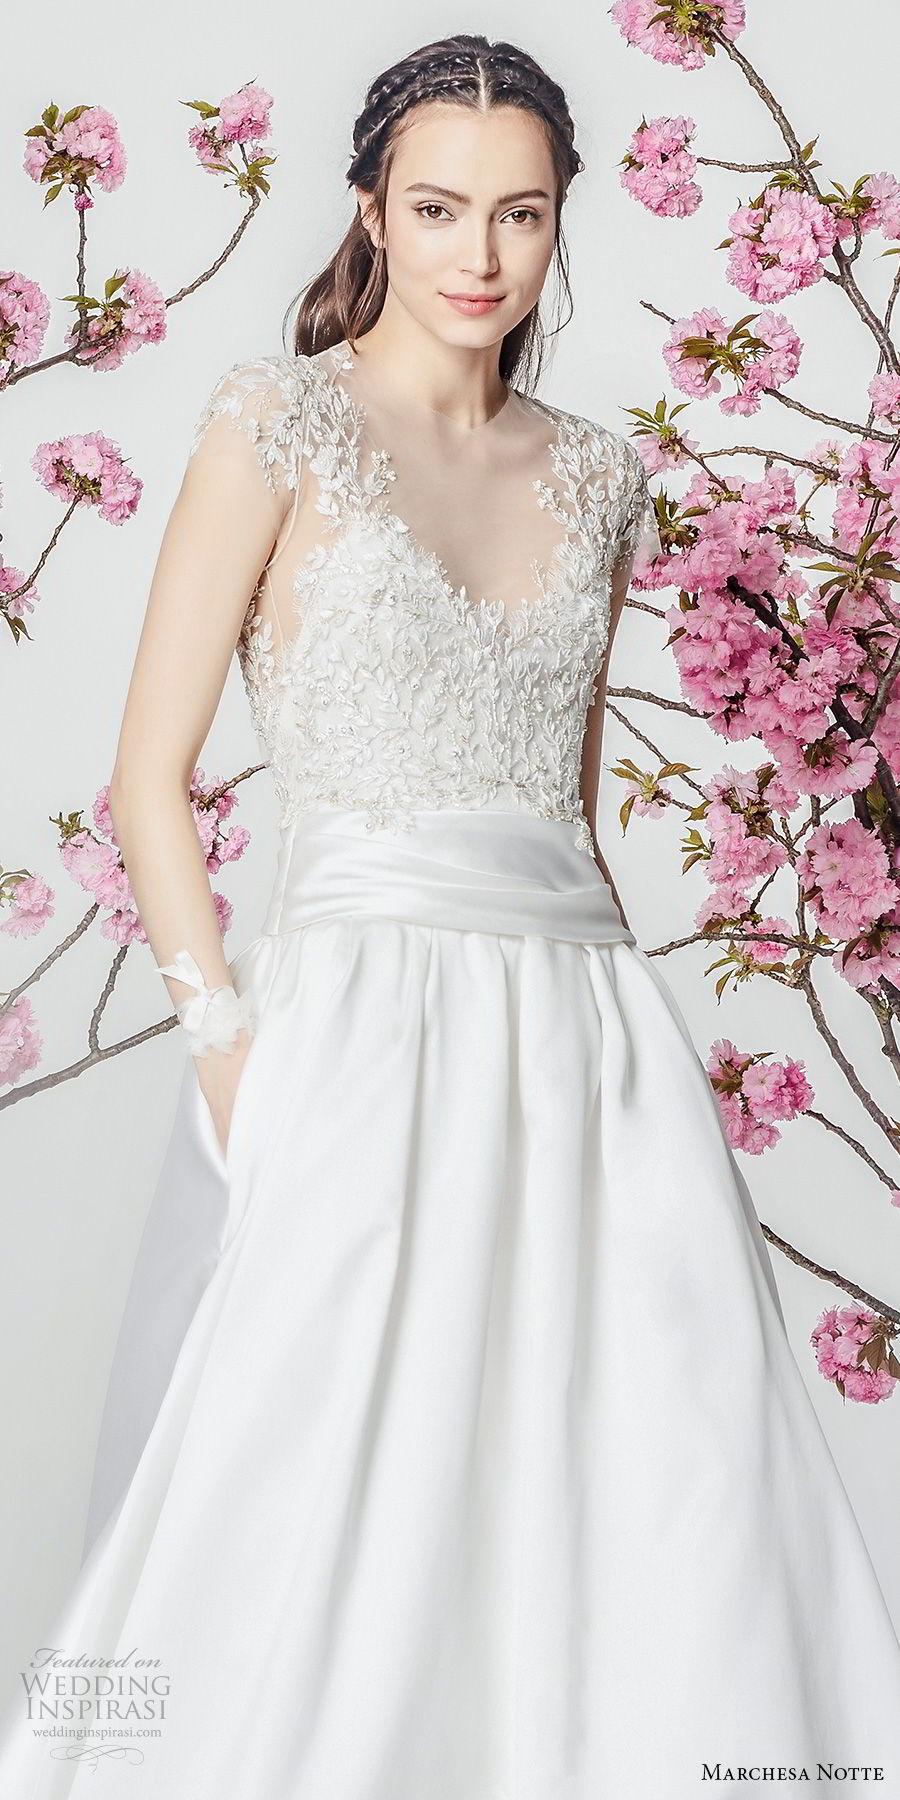 marchesa notte spring 2018 bridal cap sleeves sccop neckline heavily embellished bodice satin skirt romantic a  line wedding dress with pockets chapel train (14) zv